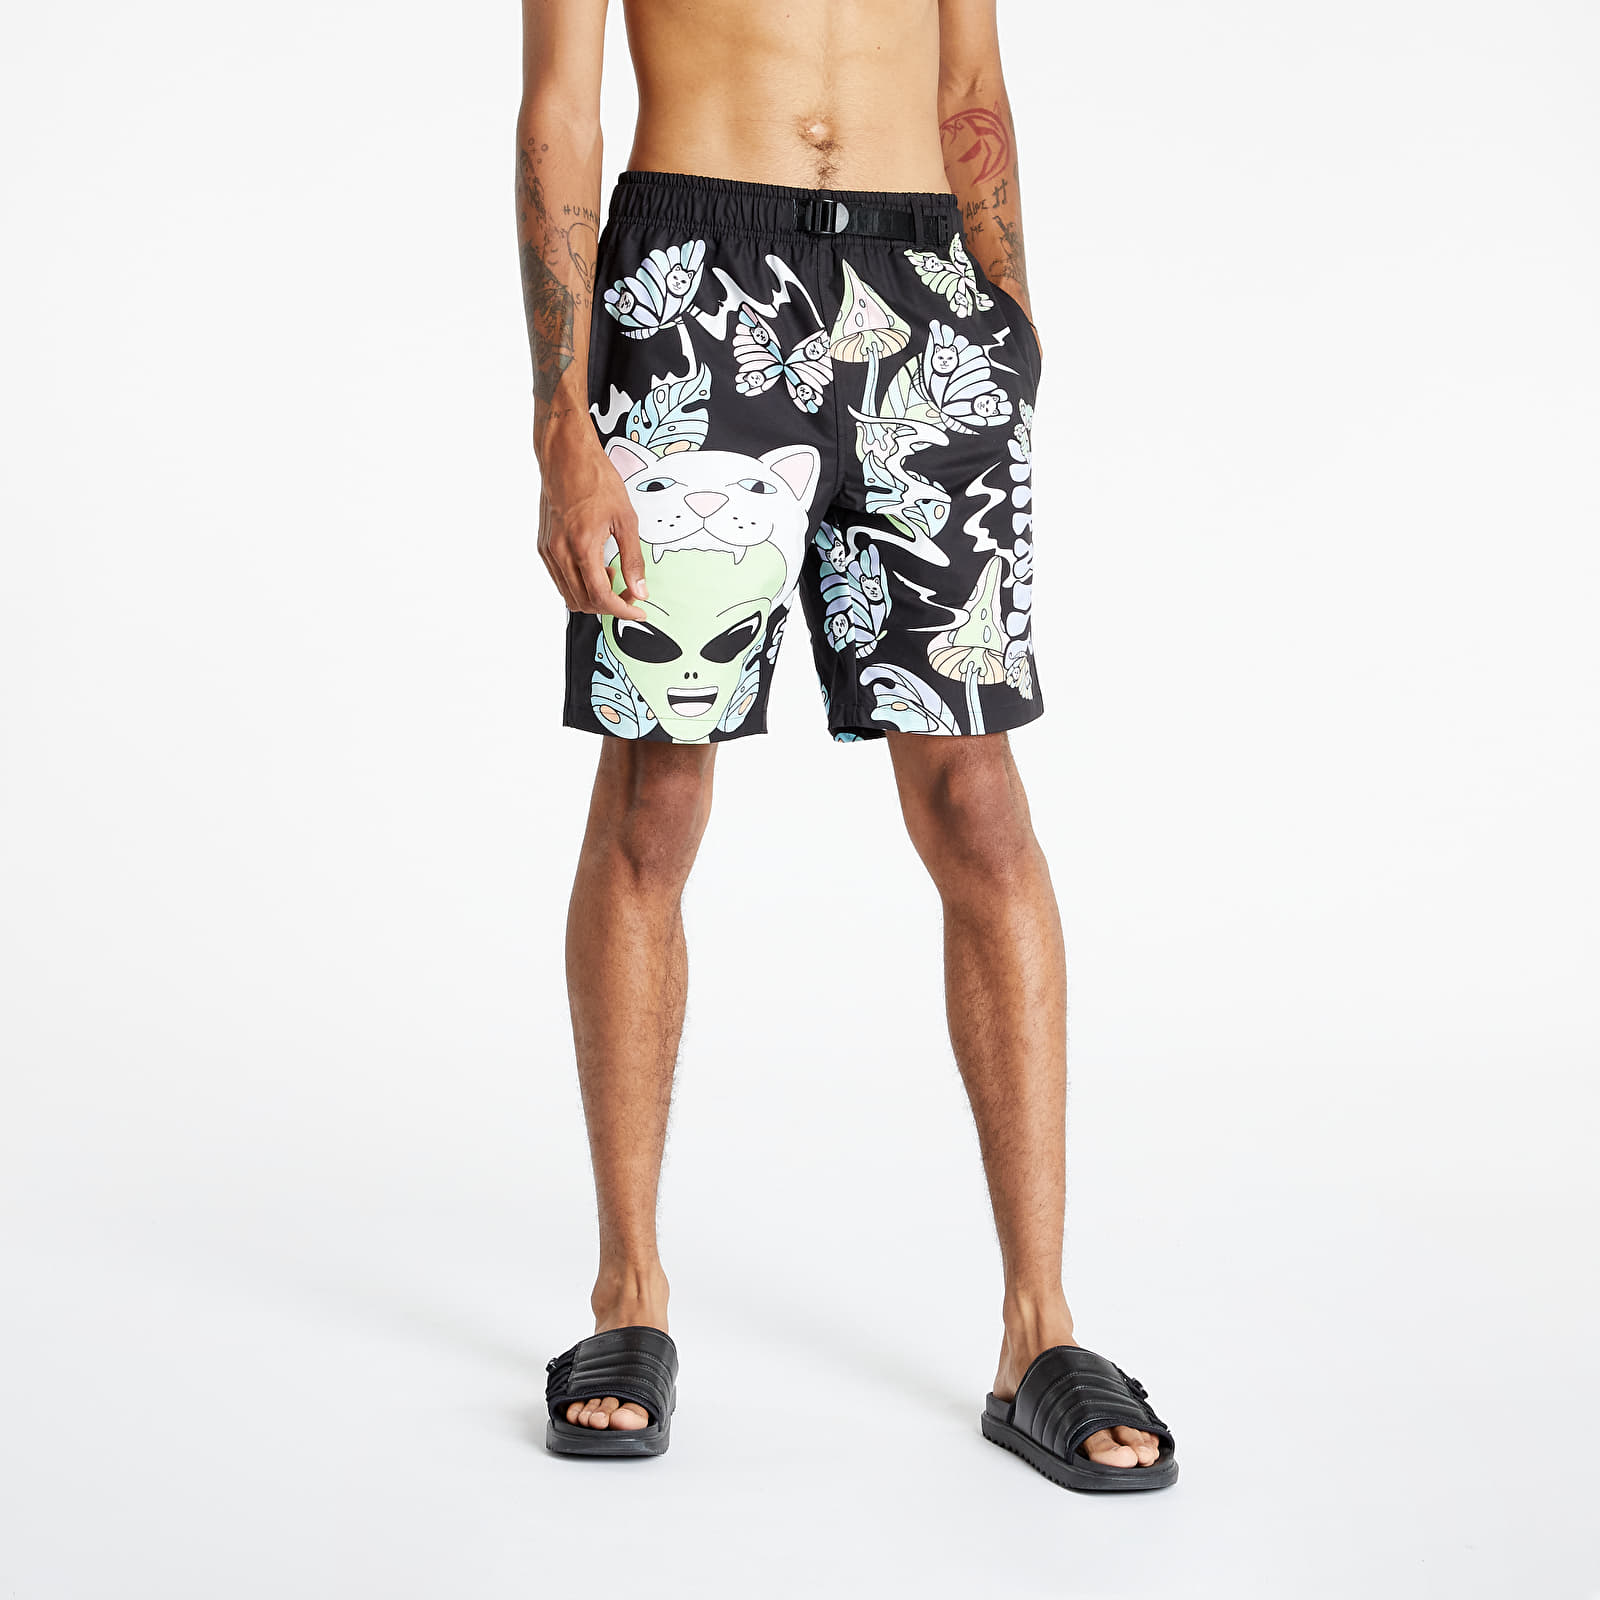 RIPNDIP Think Factory Swim Shorts Black